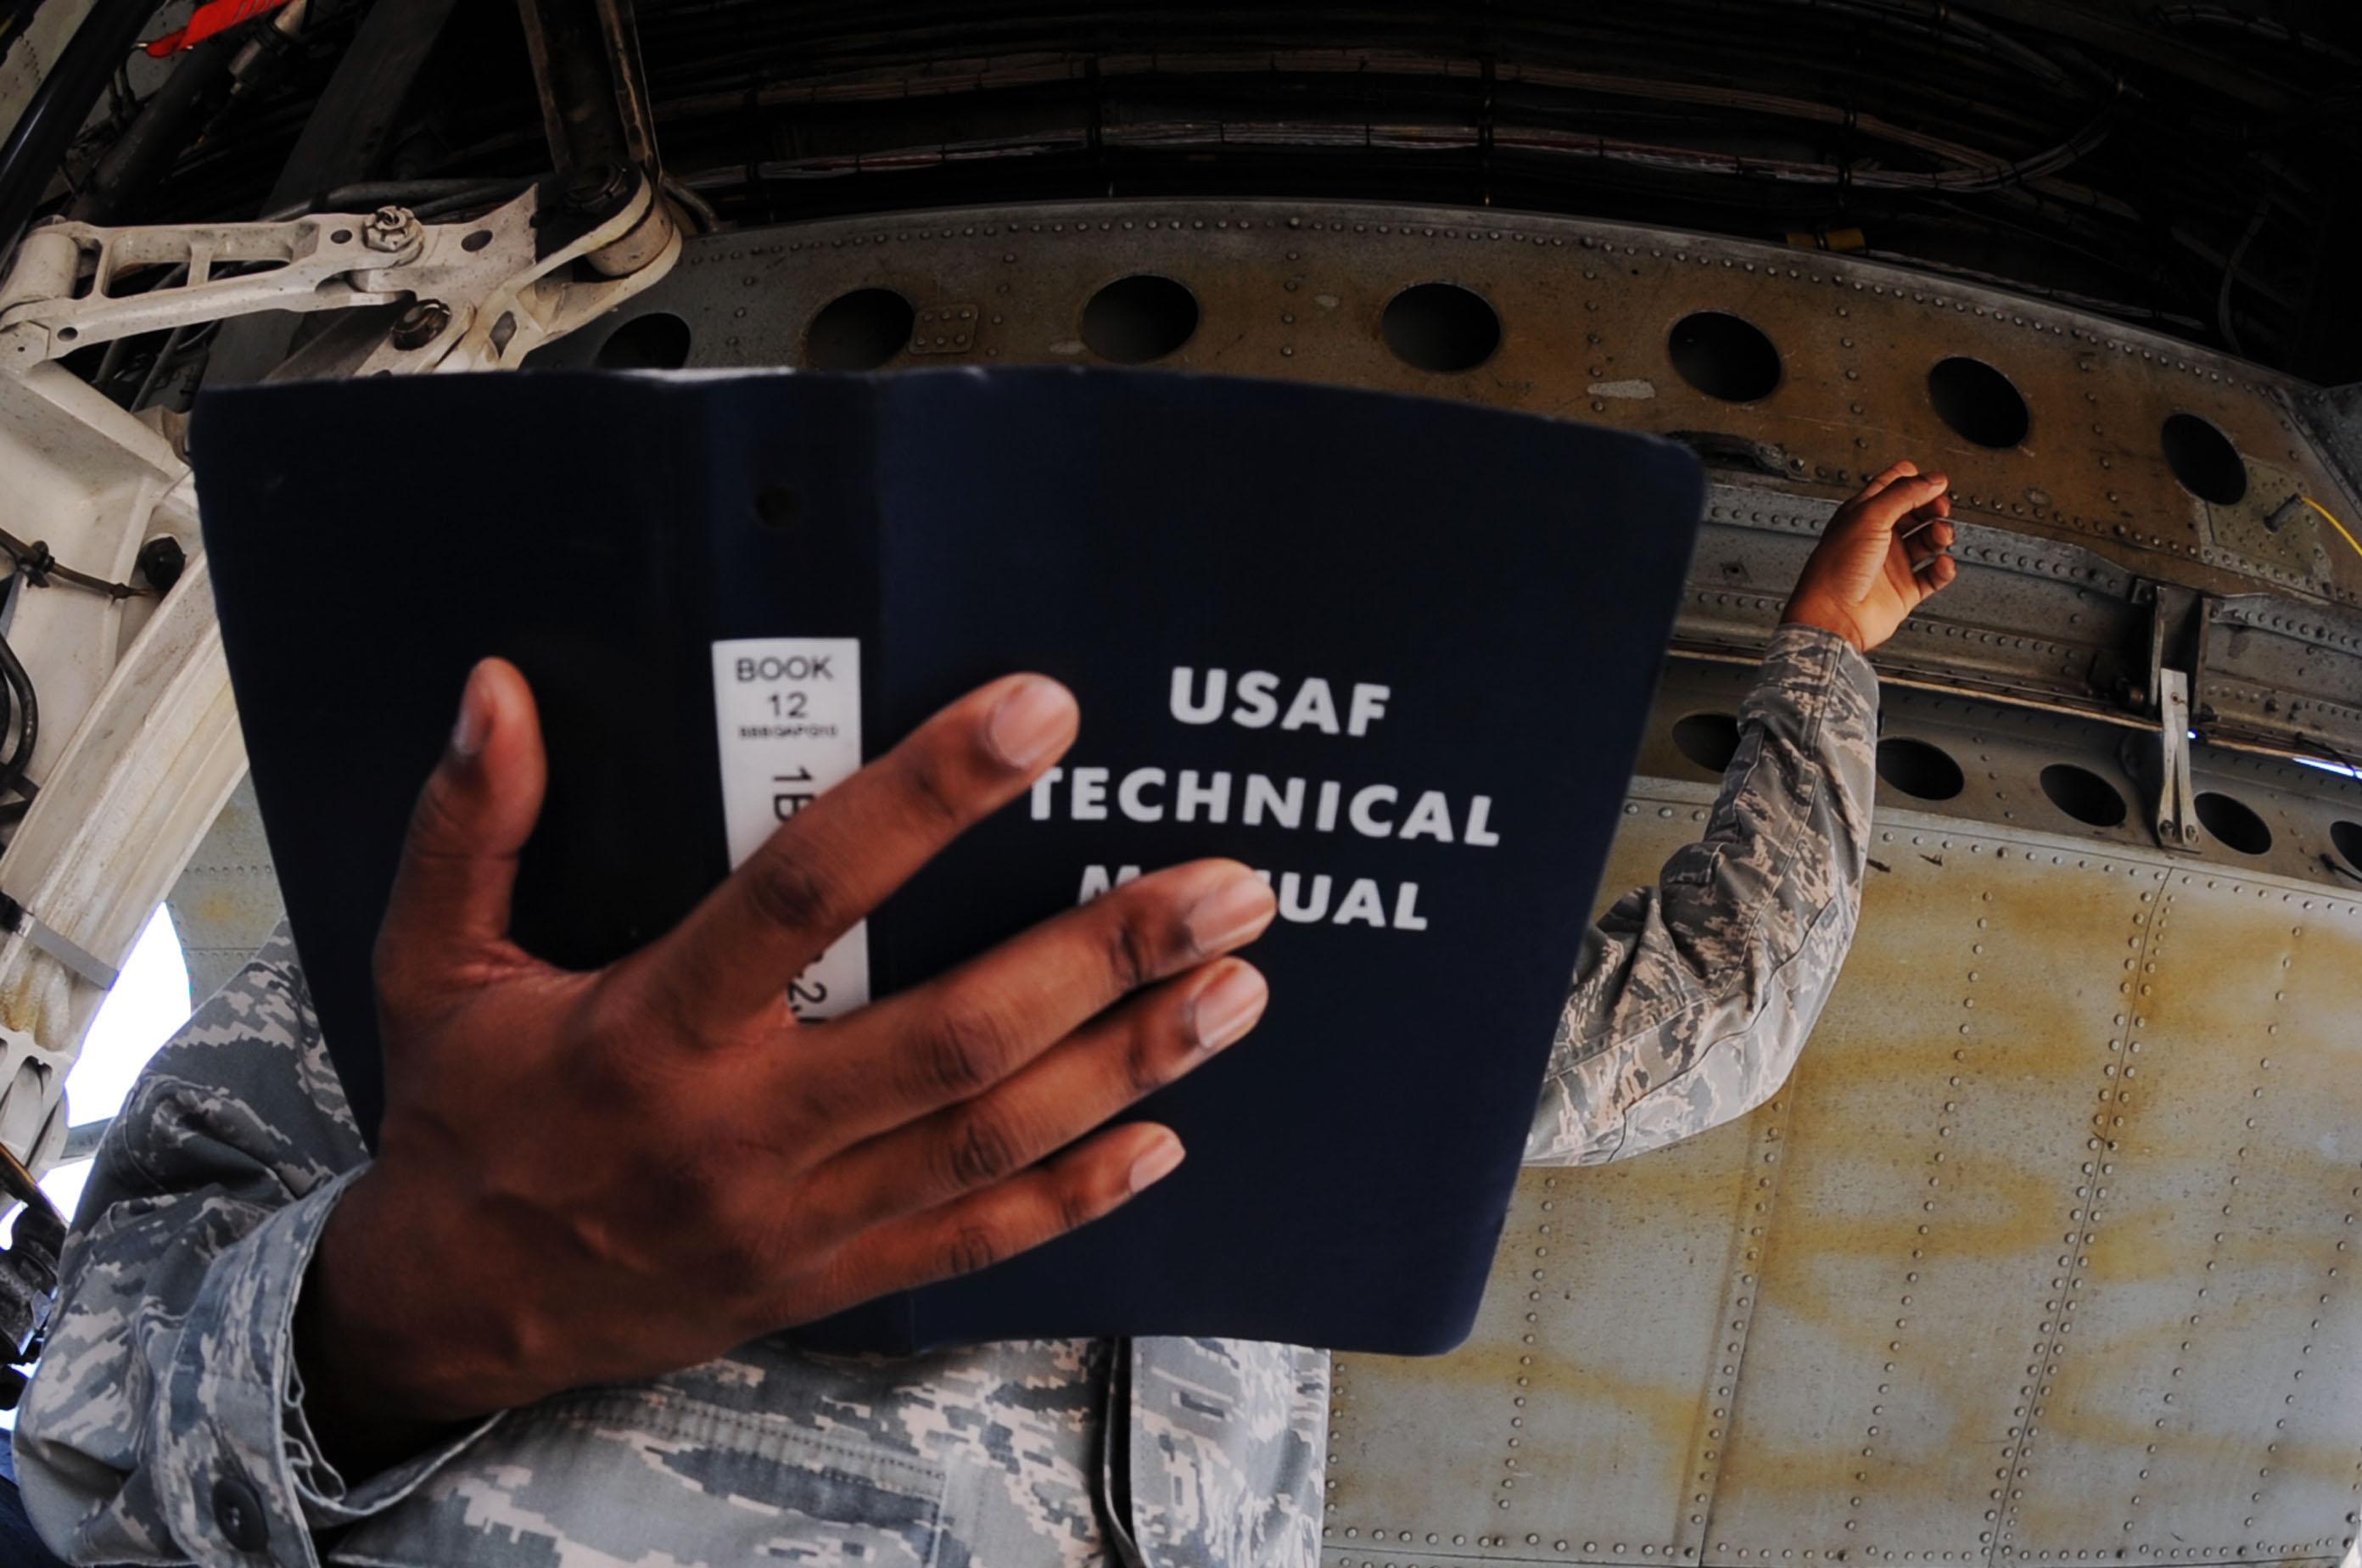 photos rh barksdale af mil air force technical manual for mc 6 parachute air force technical manual for mc 6 parachute